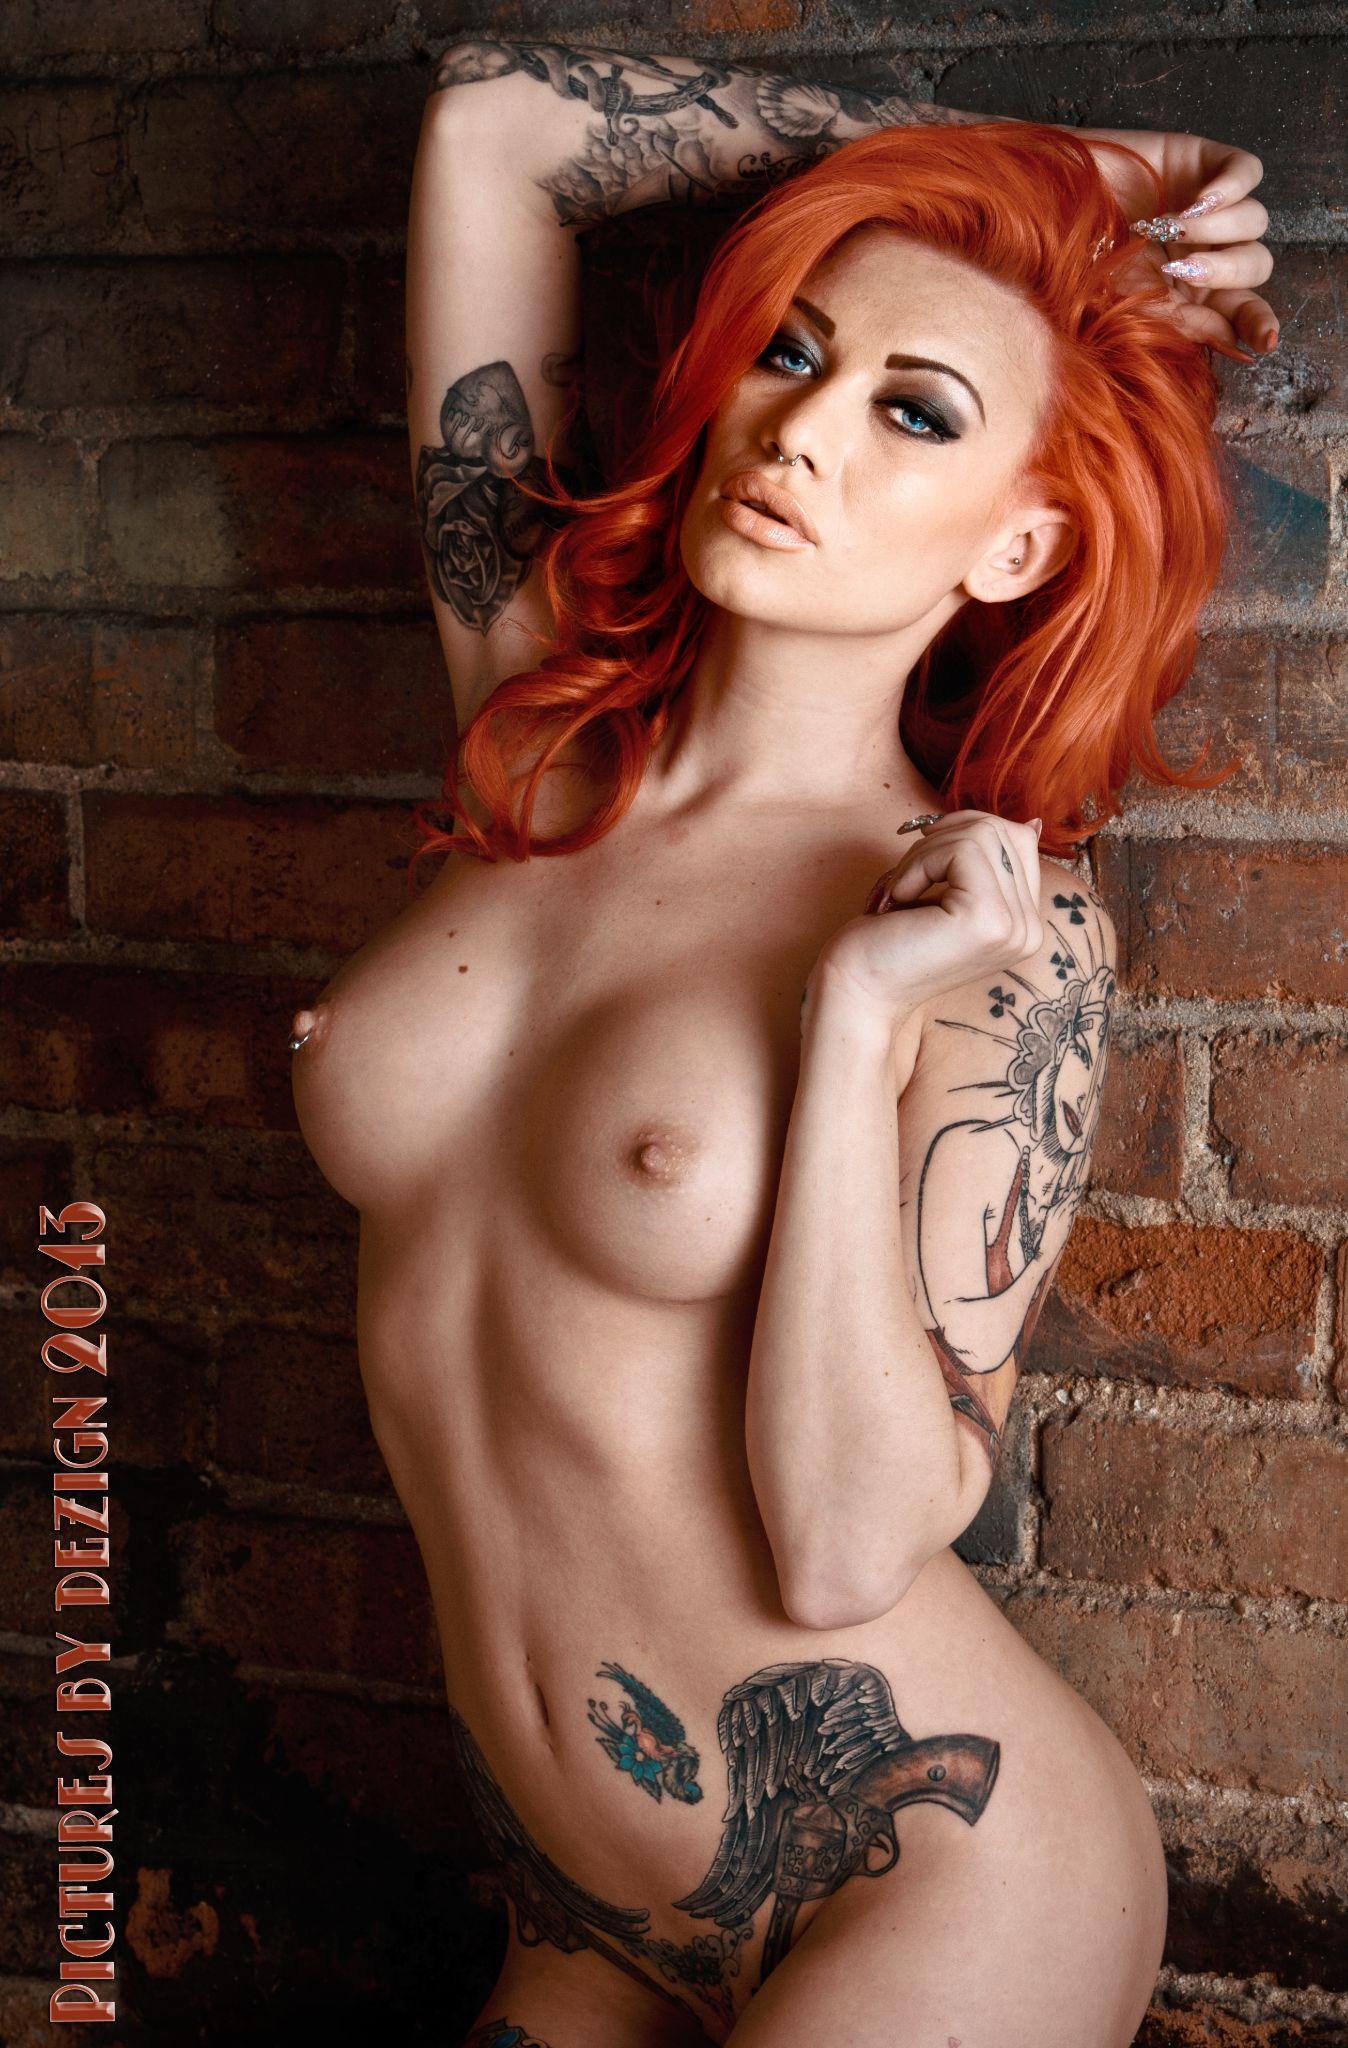 Becky by Ken Hood Photography